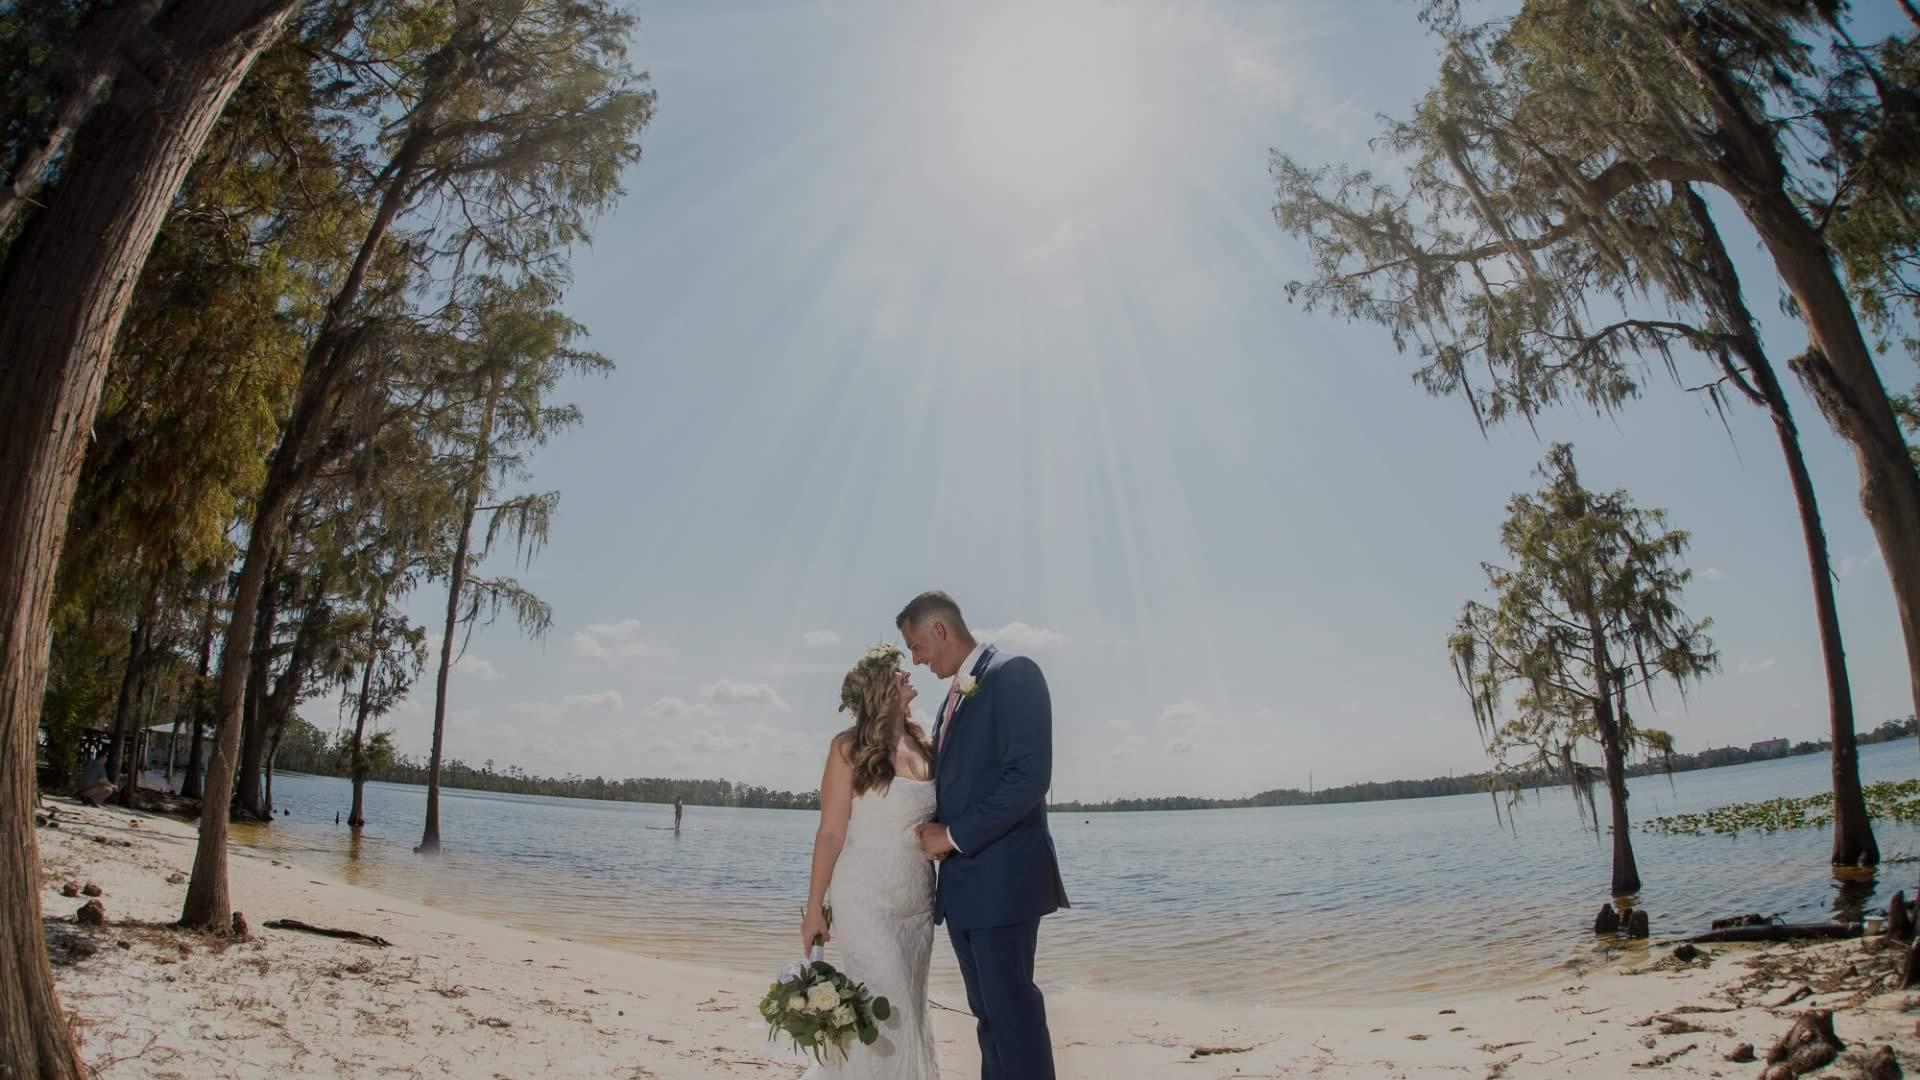 Orlando Intimate Weddings - Sensational Ceremonies